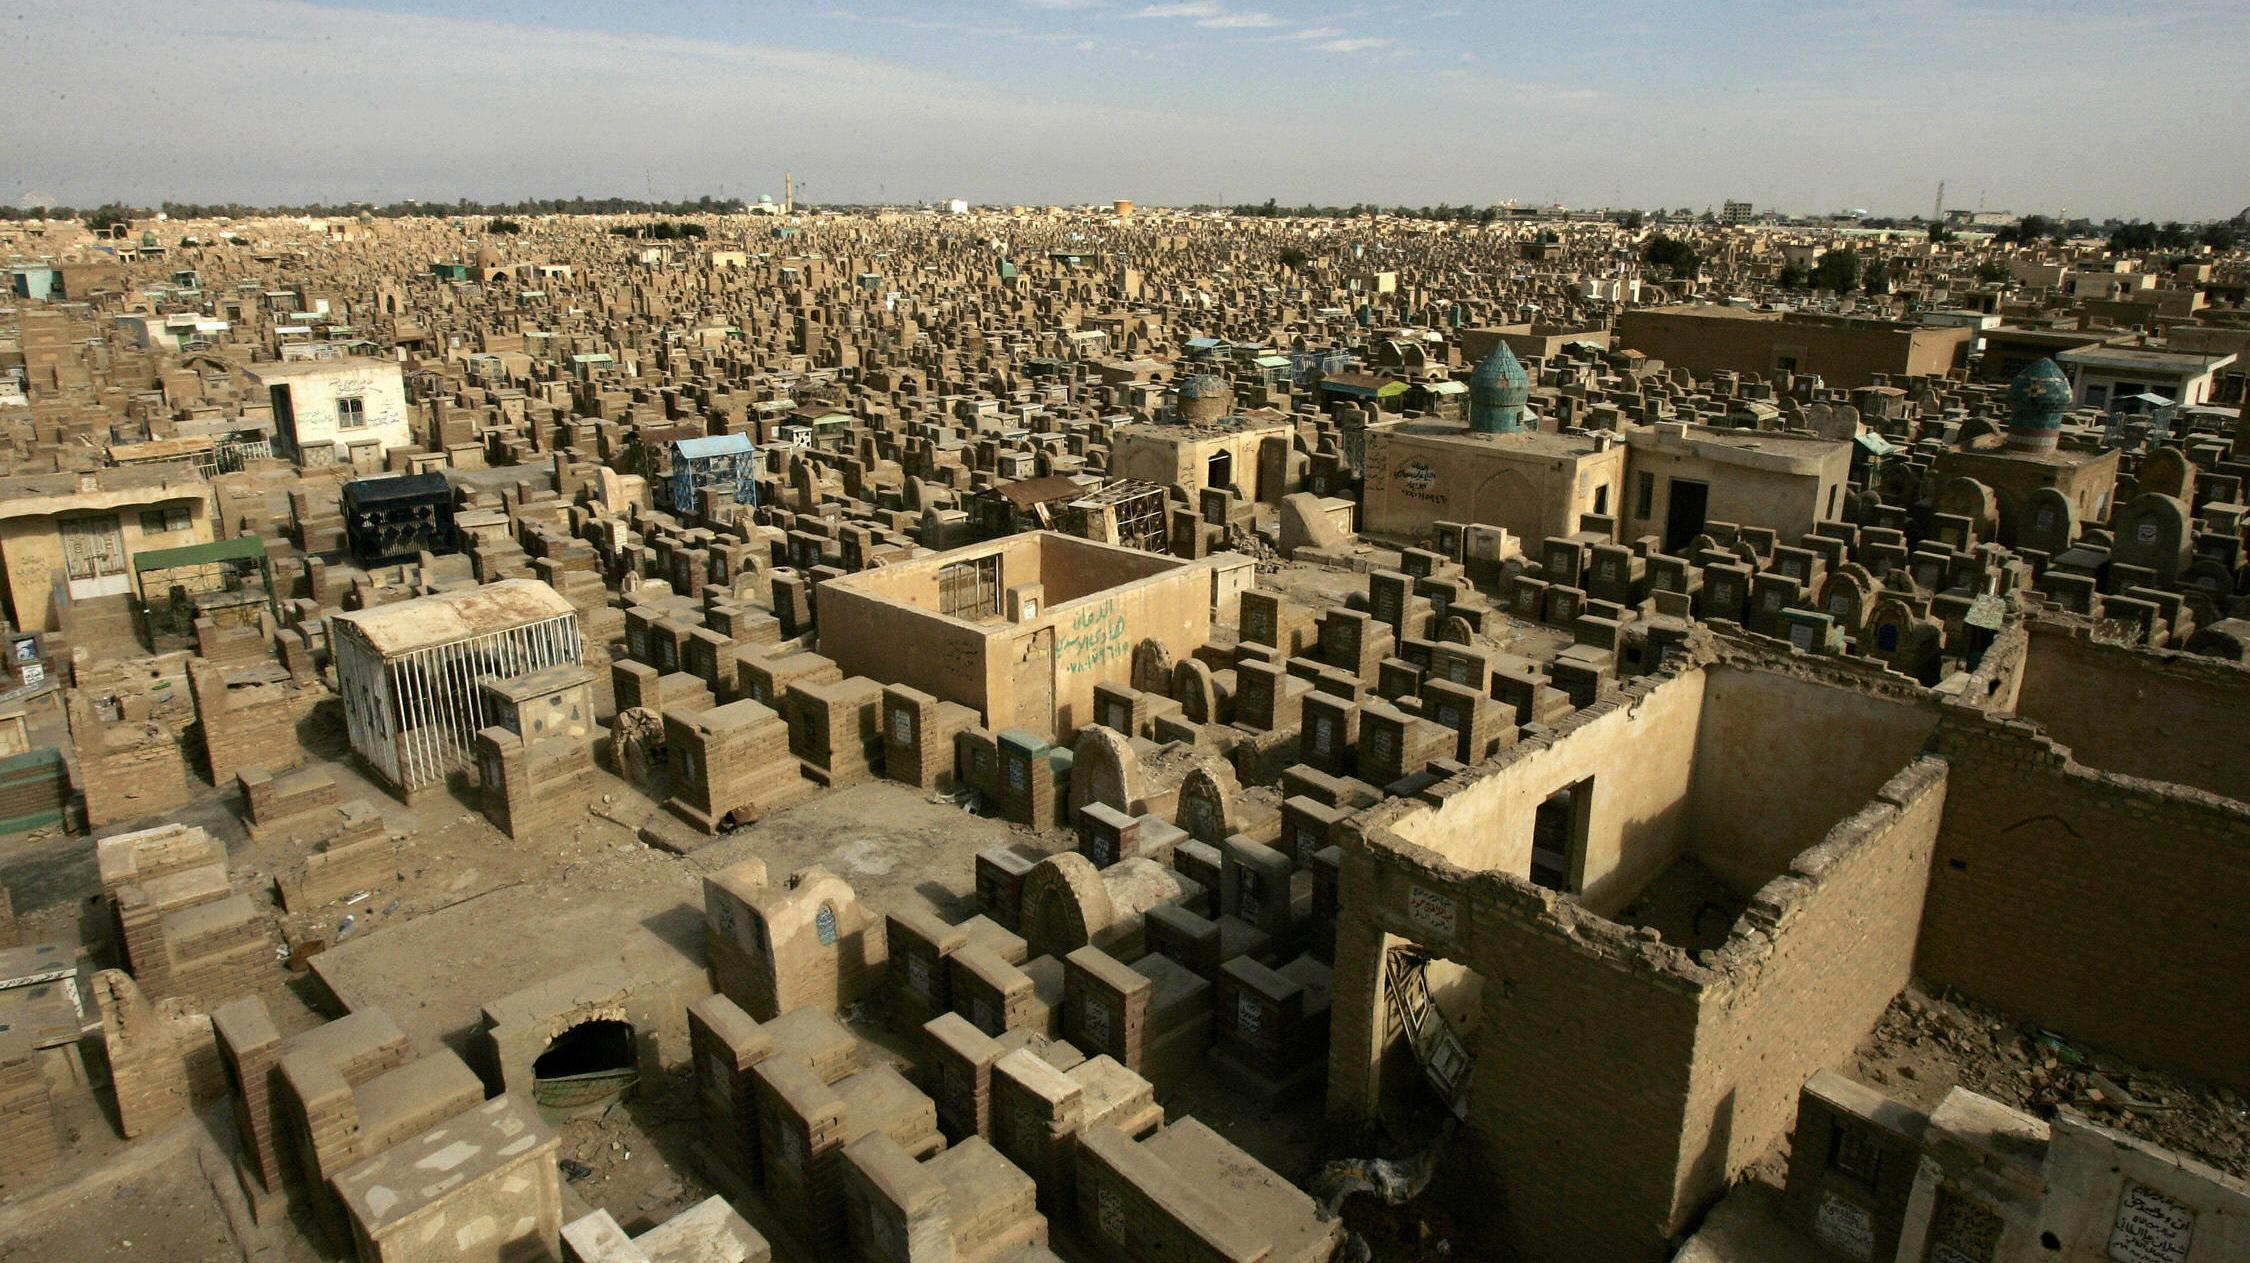 an najaf muslim Najaf is home to the tomb of imam ali  najaf capital of islamic culture roseaslan most people do  greeted by my host sami rasouli director of the muslim.